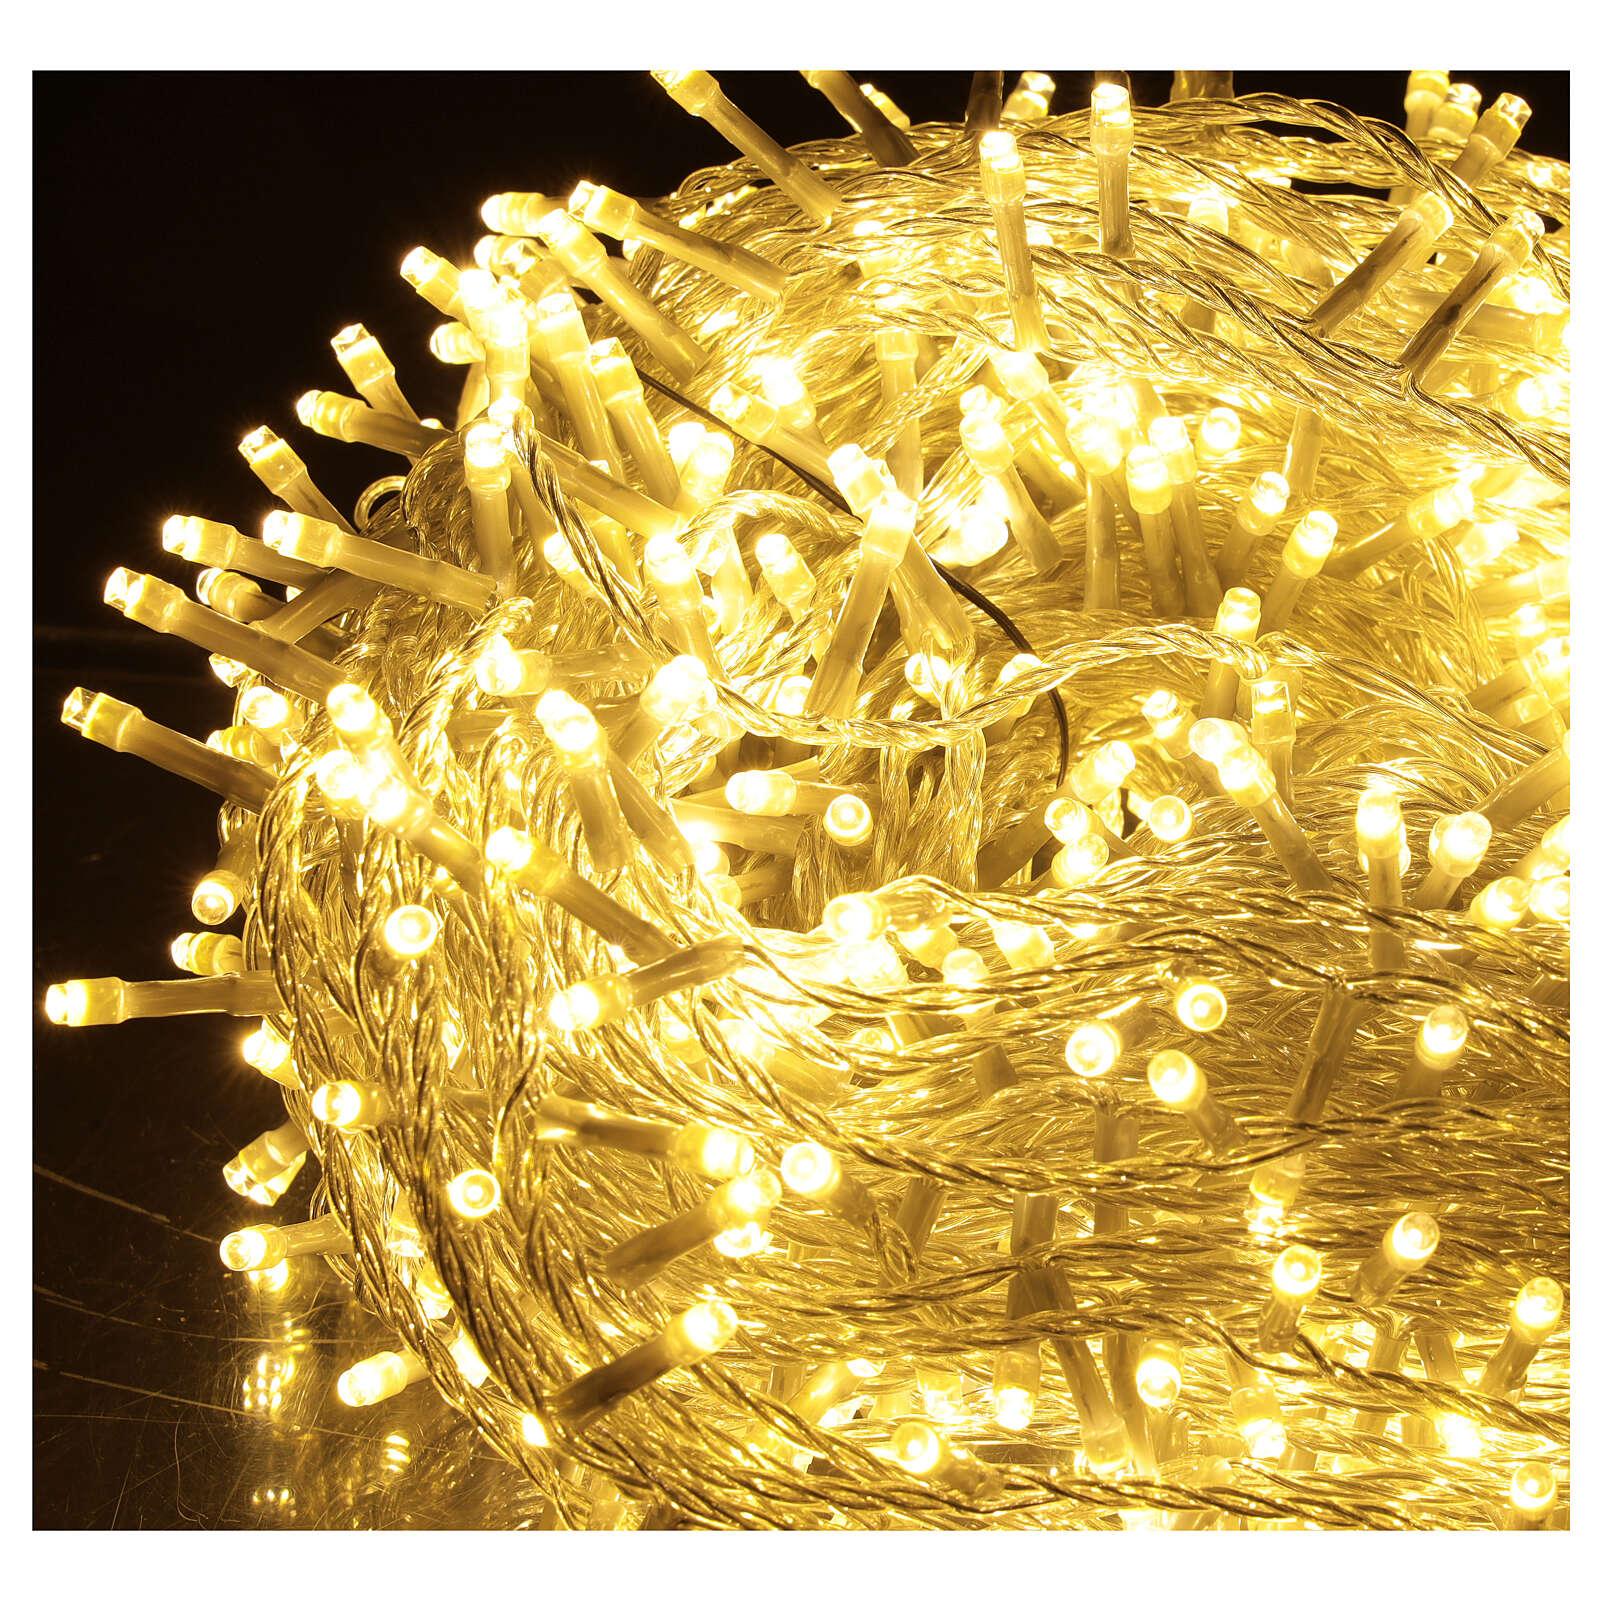 Catena LED 800 luci 2 in 1 bianco caldo freddo cavo trasparente 56 m int est 3